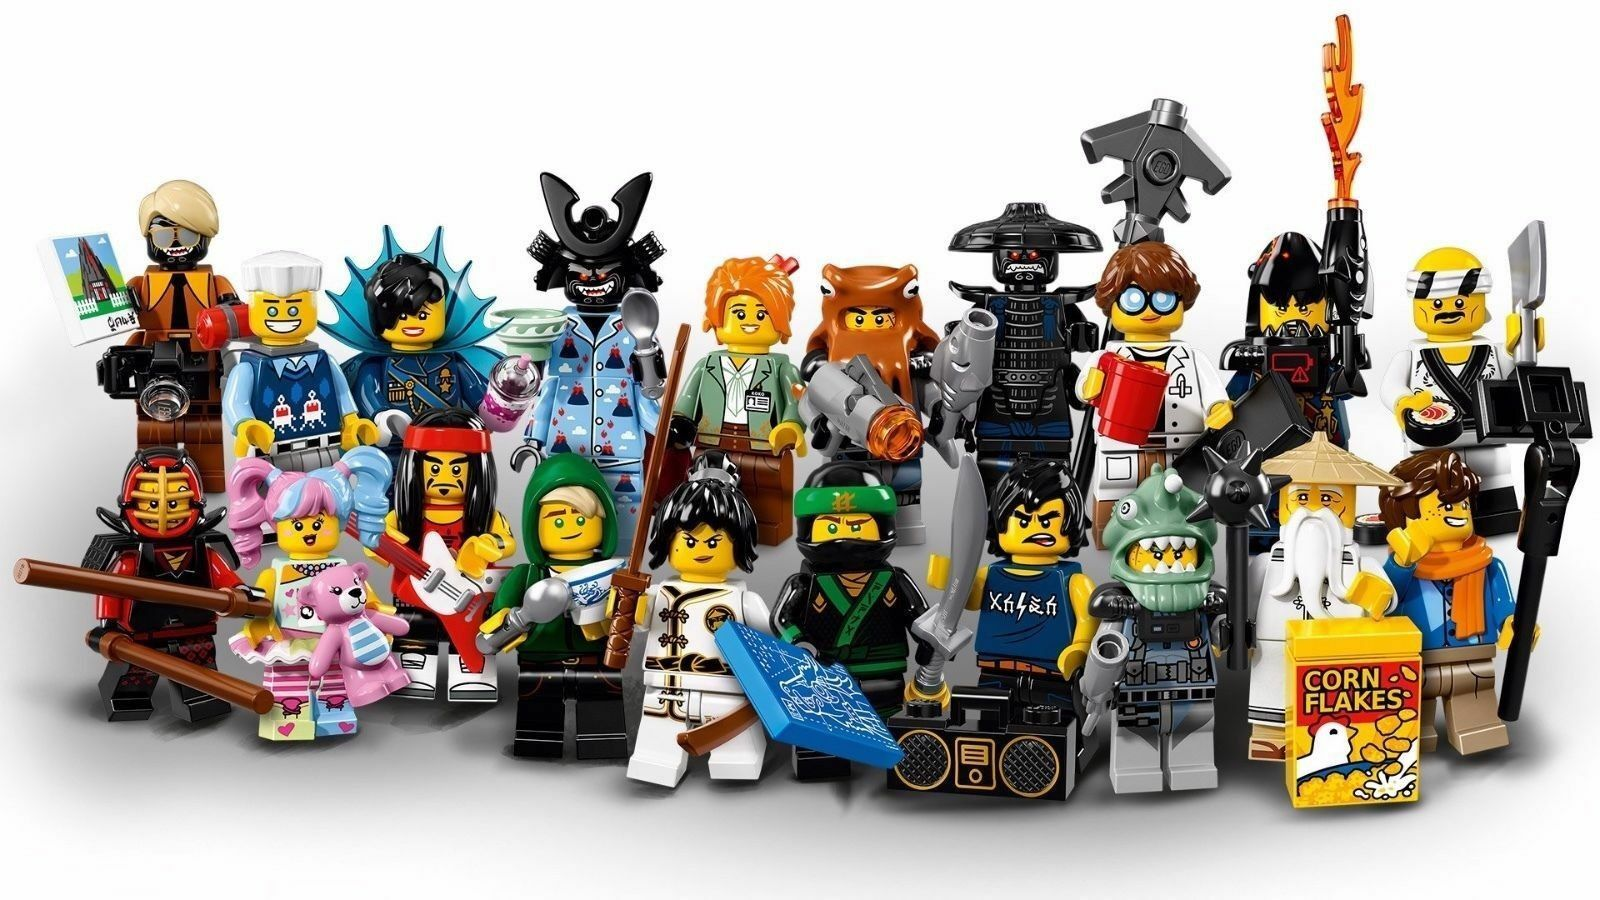 Complete Set of Lego Ninjago Movie Minifigures 71019 -Sealed Bags